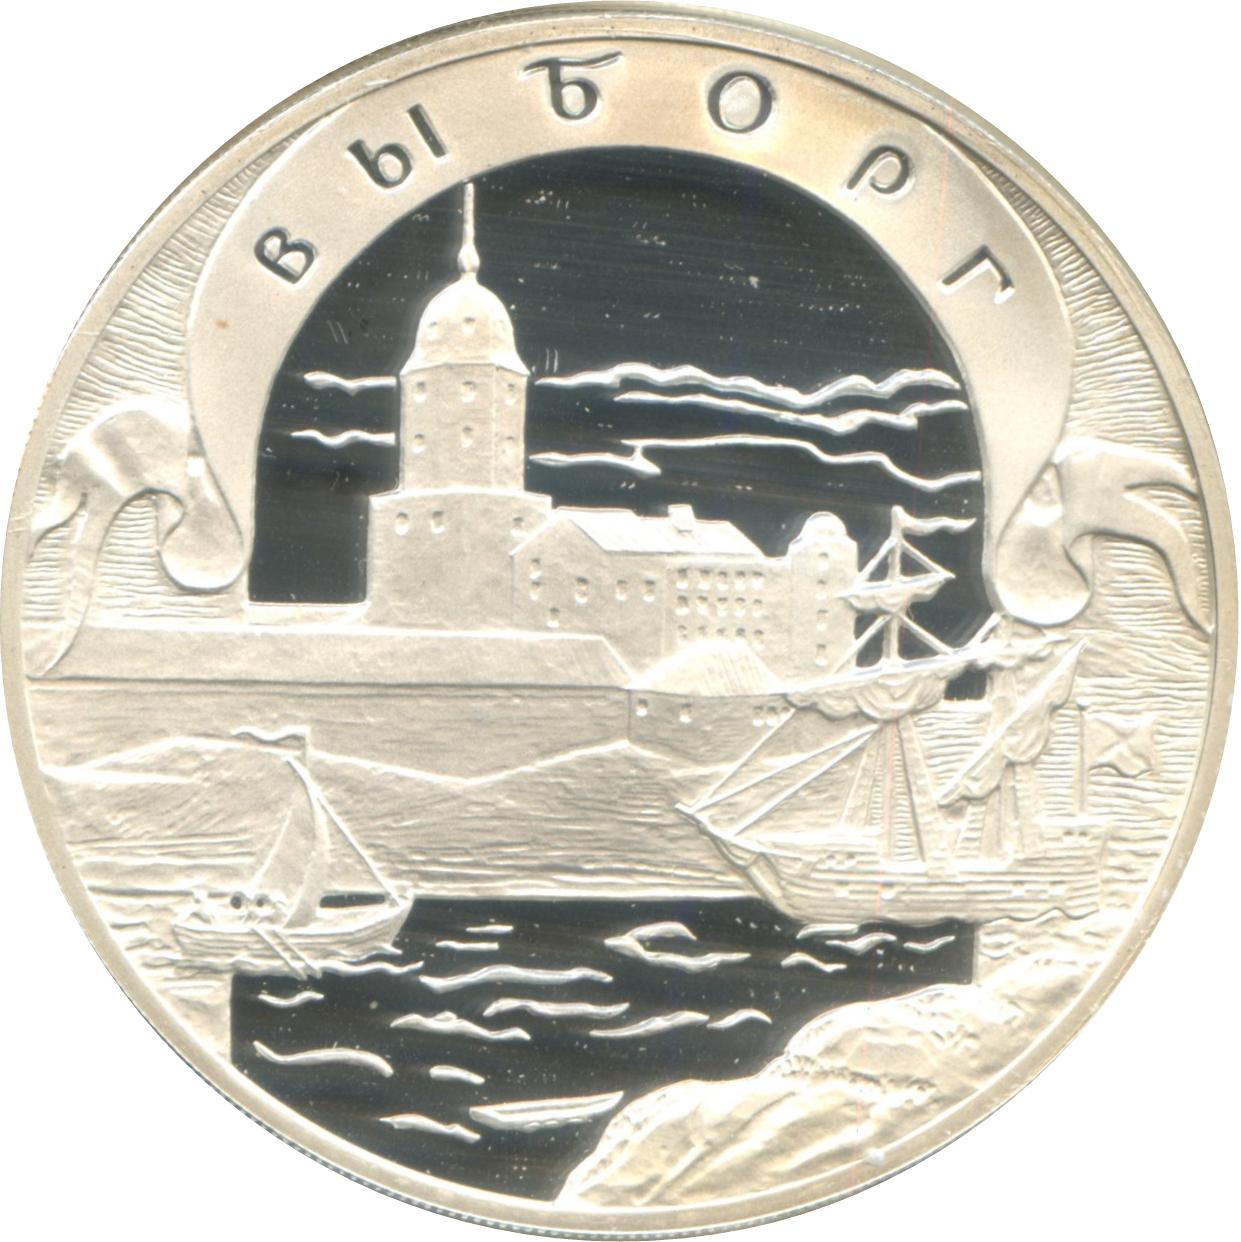 Russia 3 rubles 2003 Vyborg Silver 1 oz PROOF